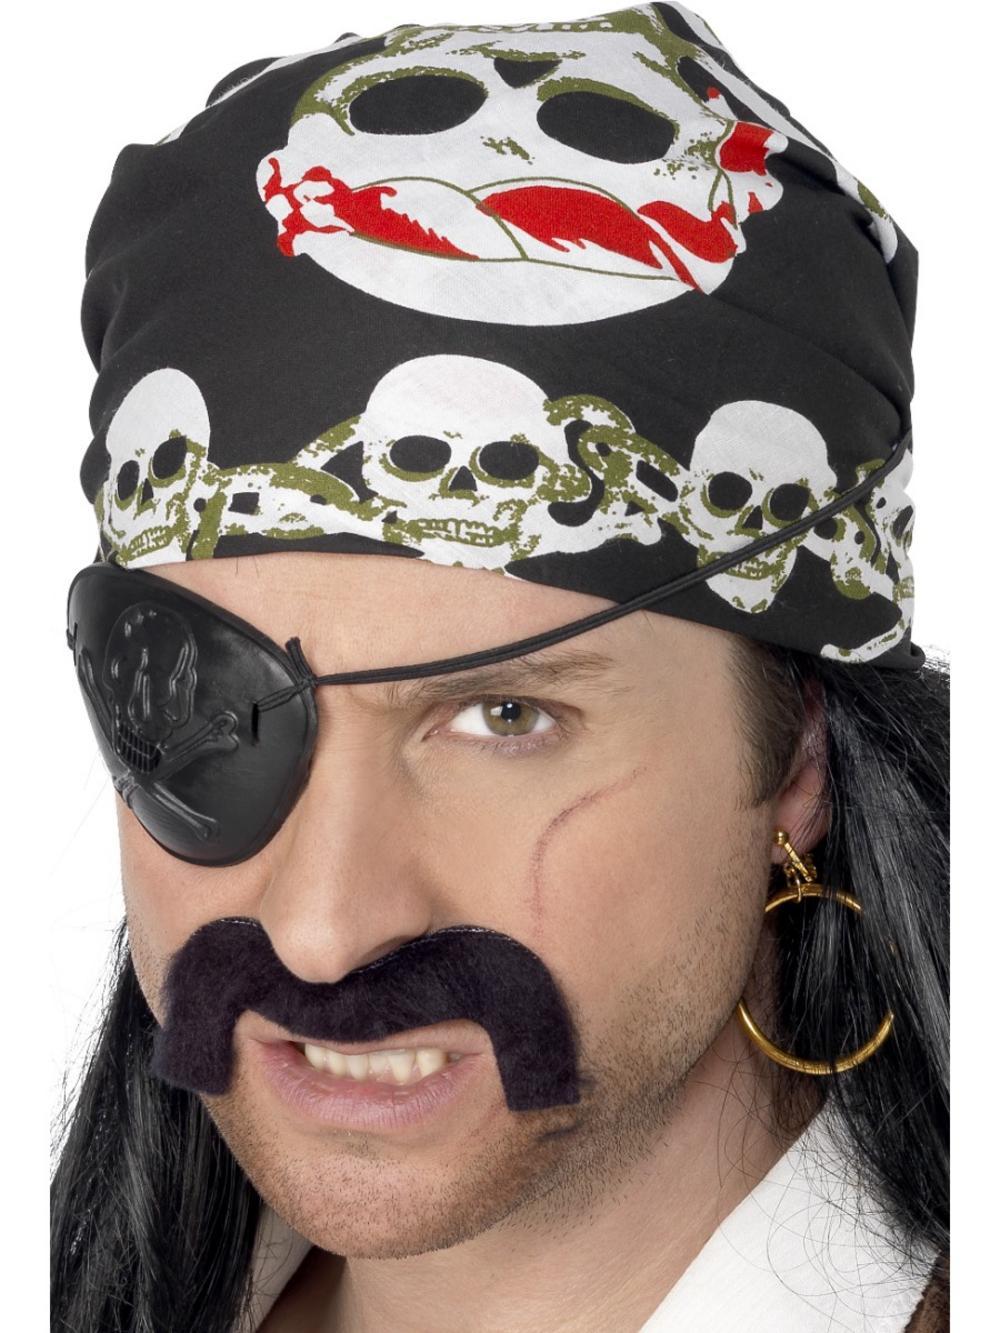 Pirate Bandana Costume Accessory